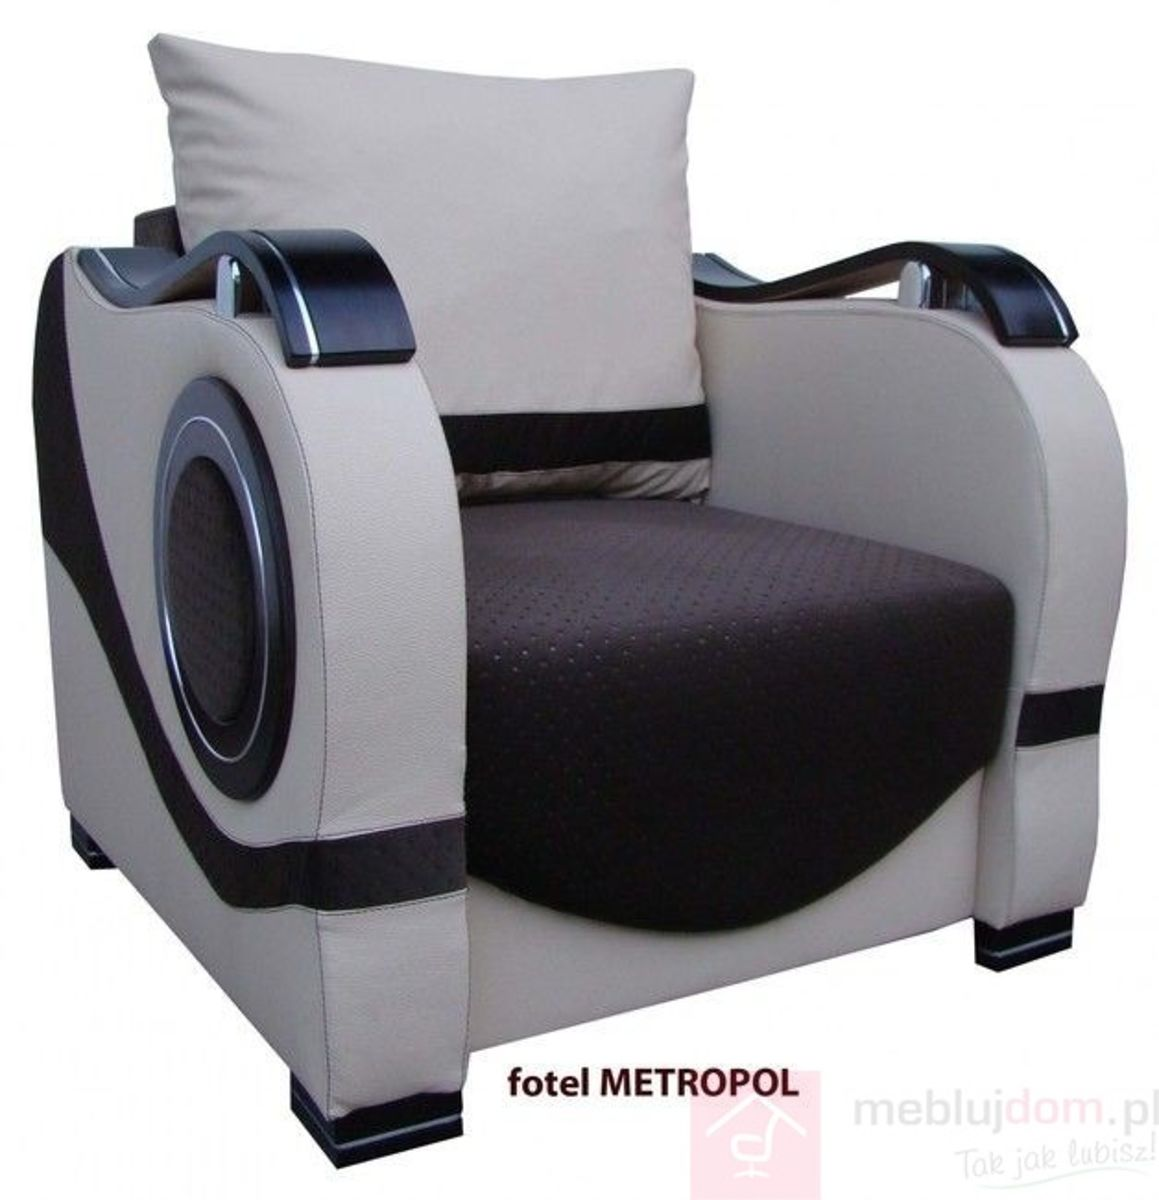 Fotel METROPOL